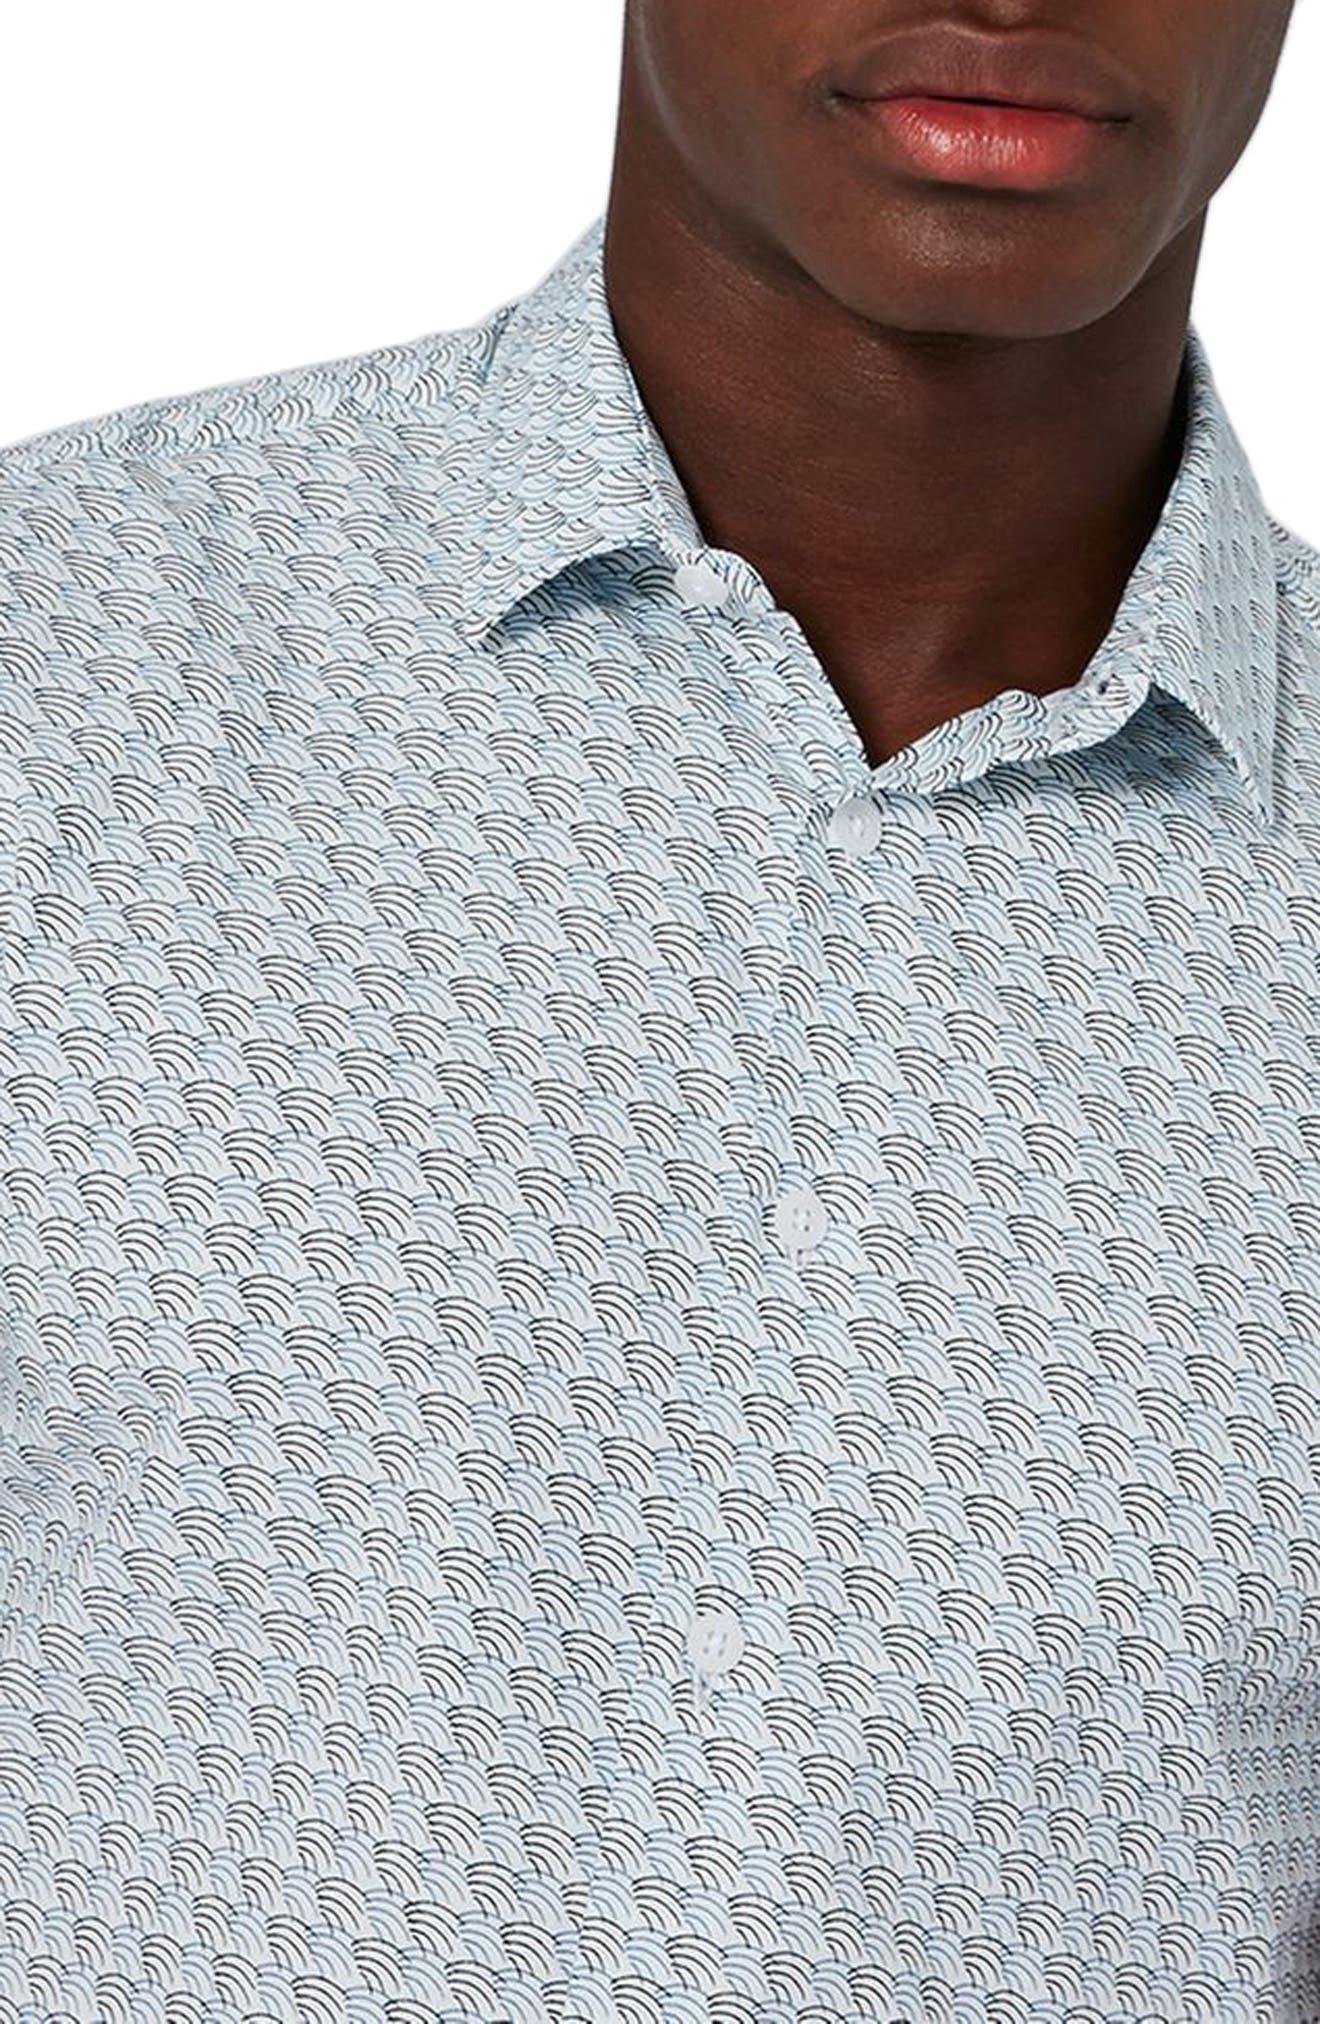 Waves Print Shirt,                             Alternate thumbnail 3, color,                             450